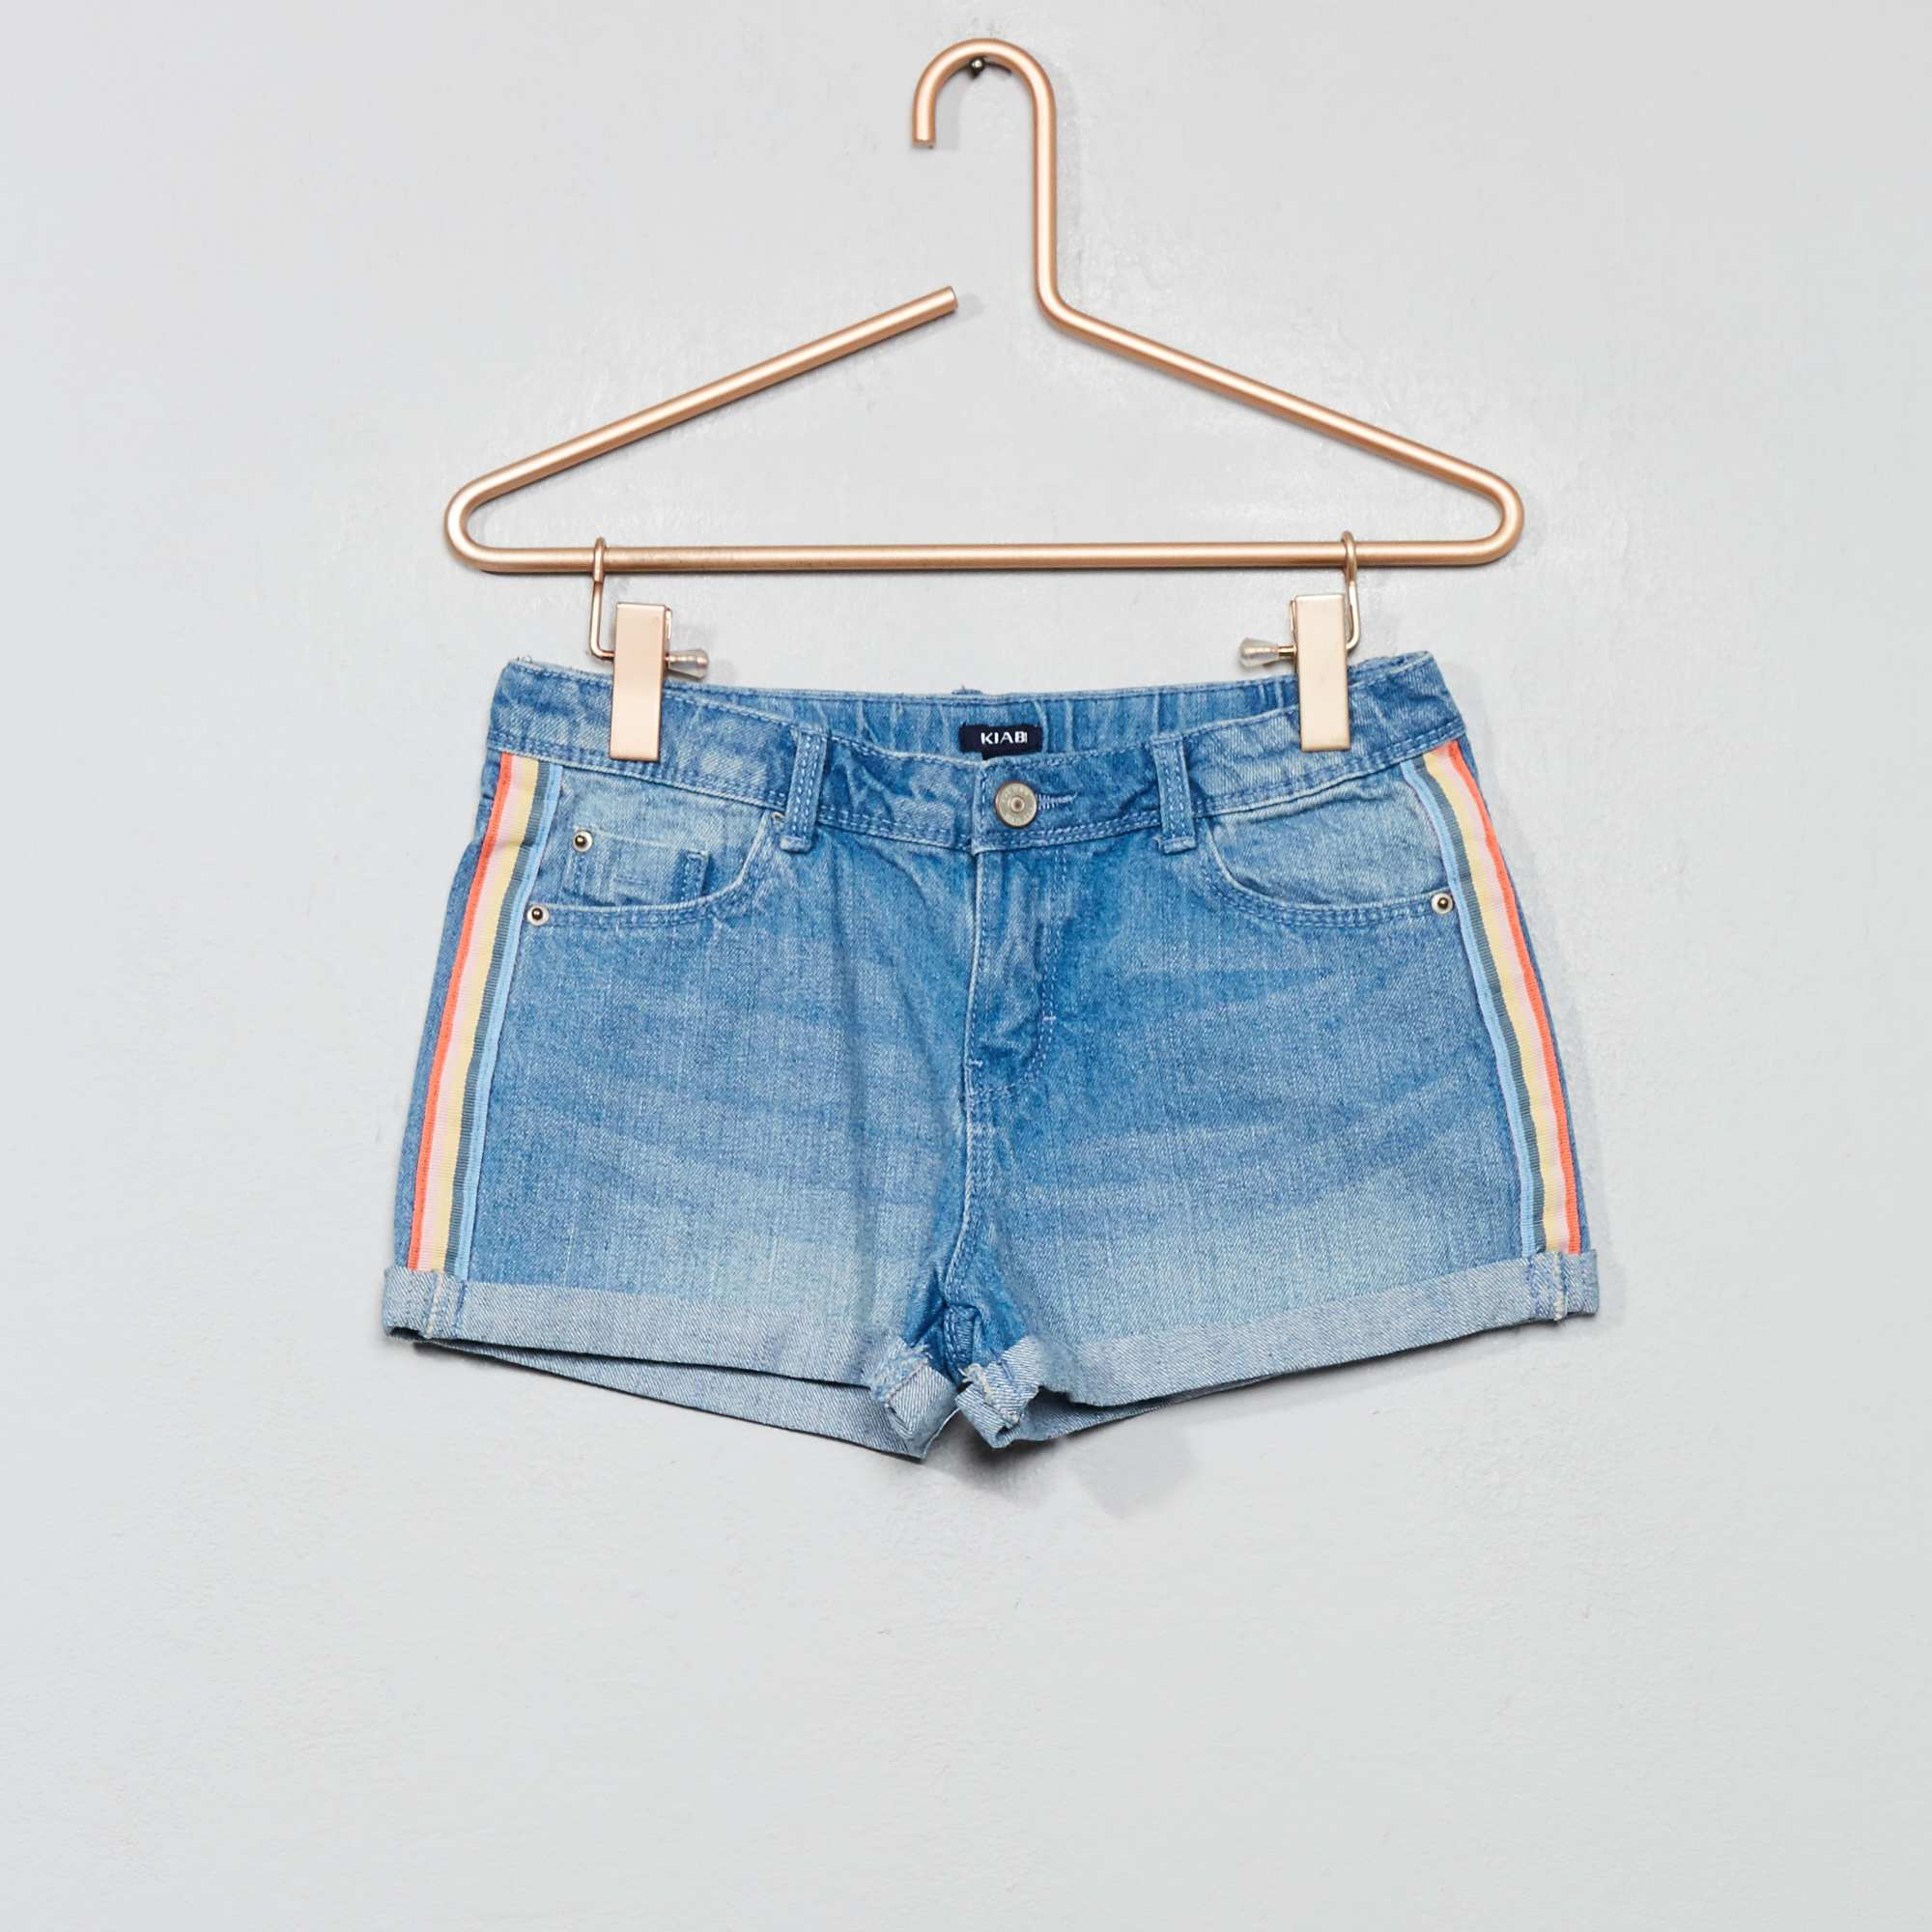 5fcaa300c2bb8 Short en jean à bandes Fille - bleu clair - Kiabi - 10,00€